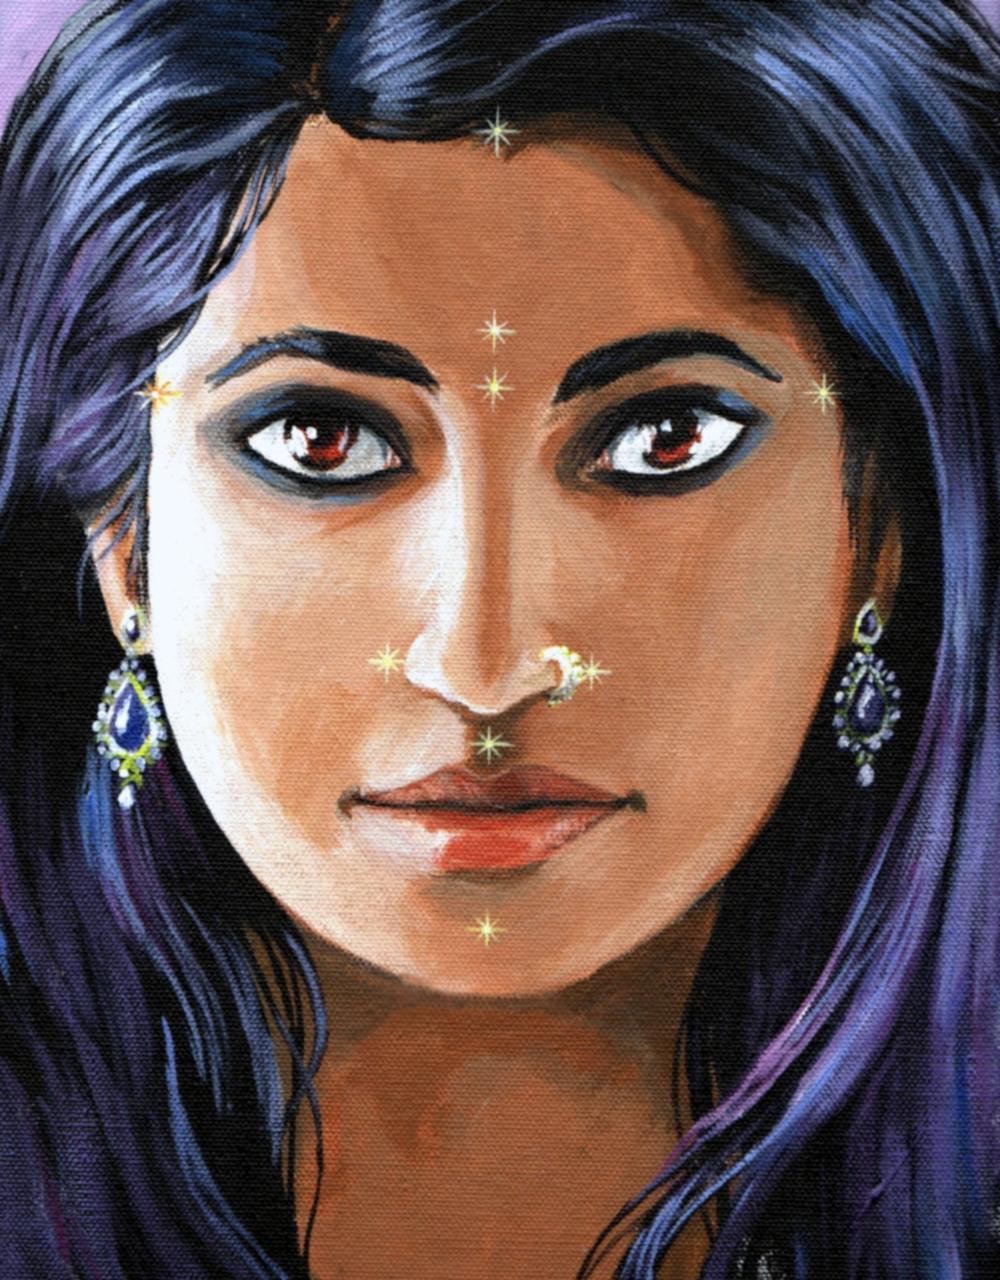 Marma Girl by artist Ricardo Dieguez